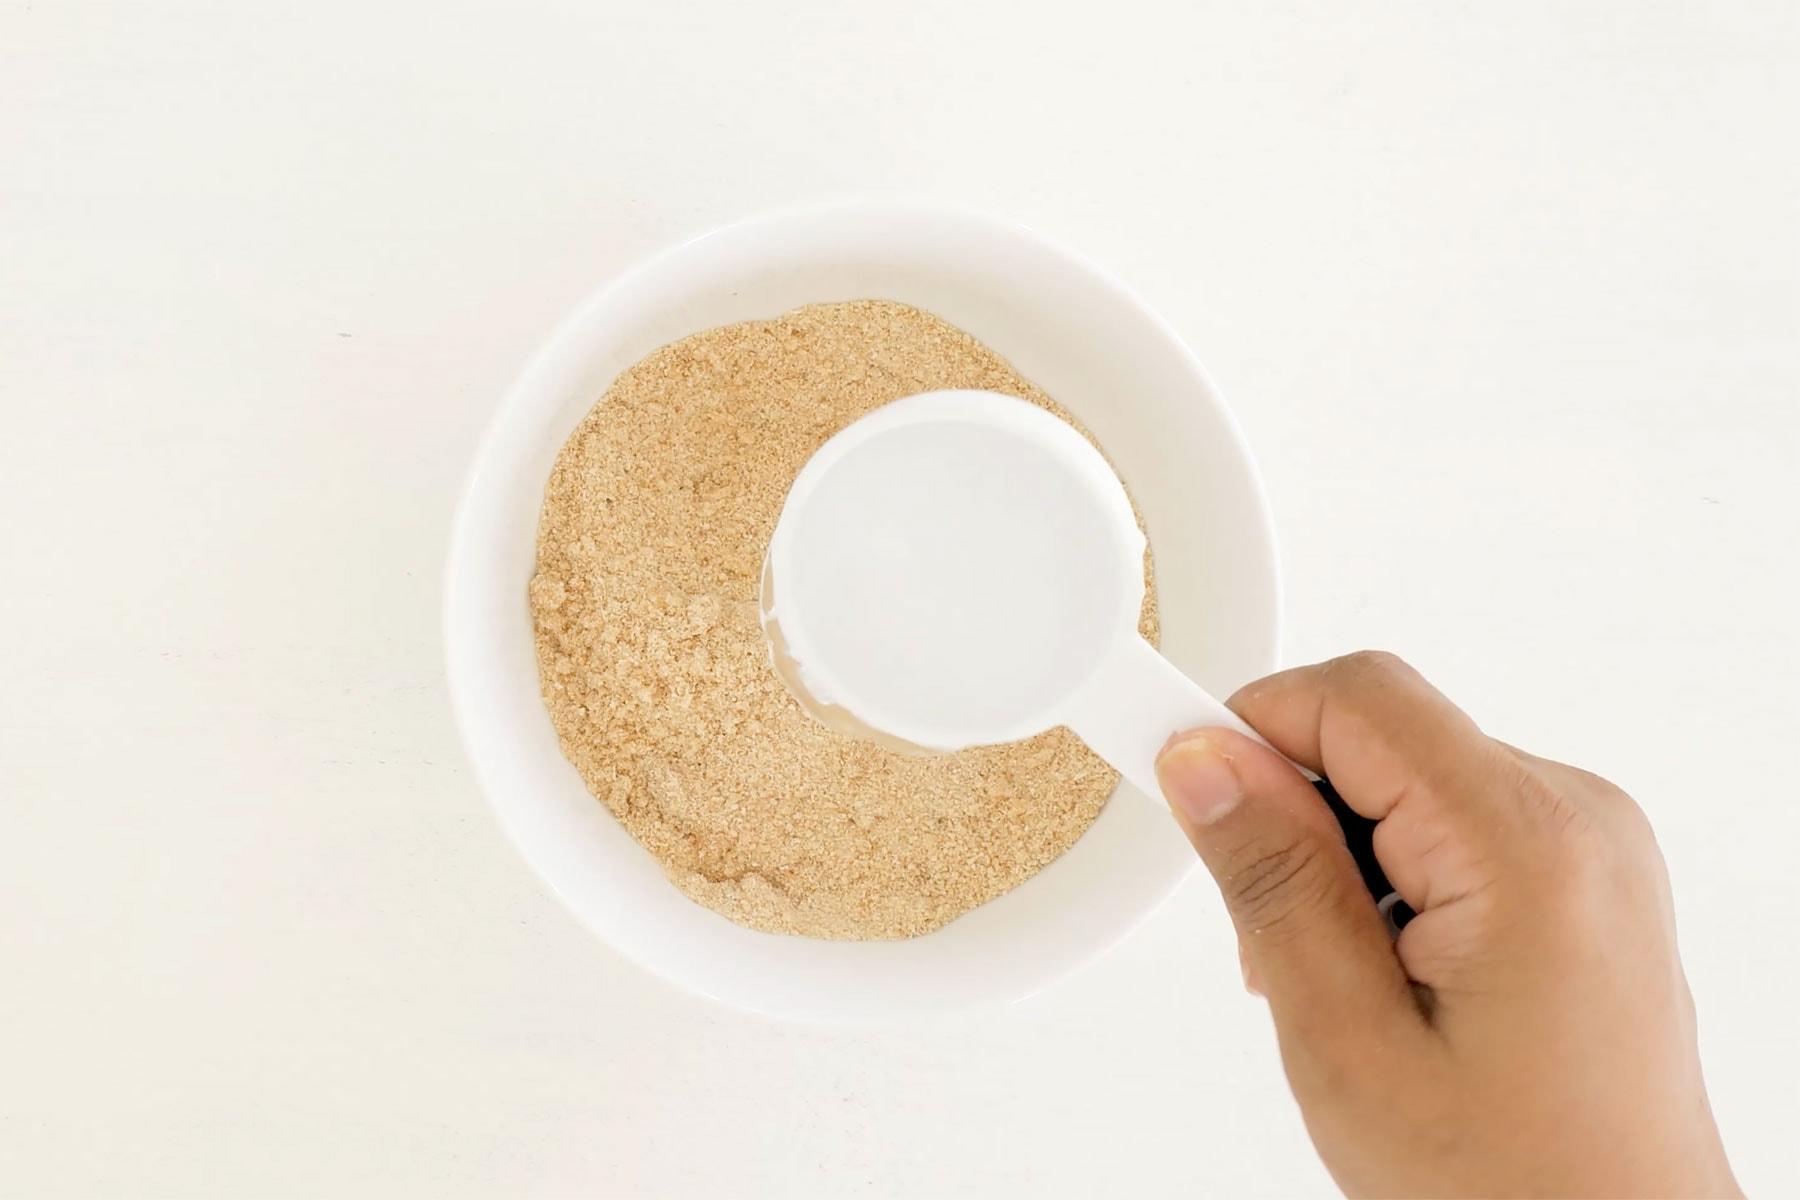 Adding water to yuca flour